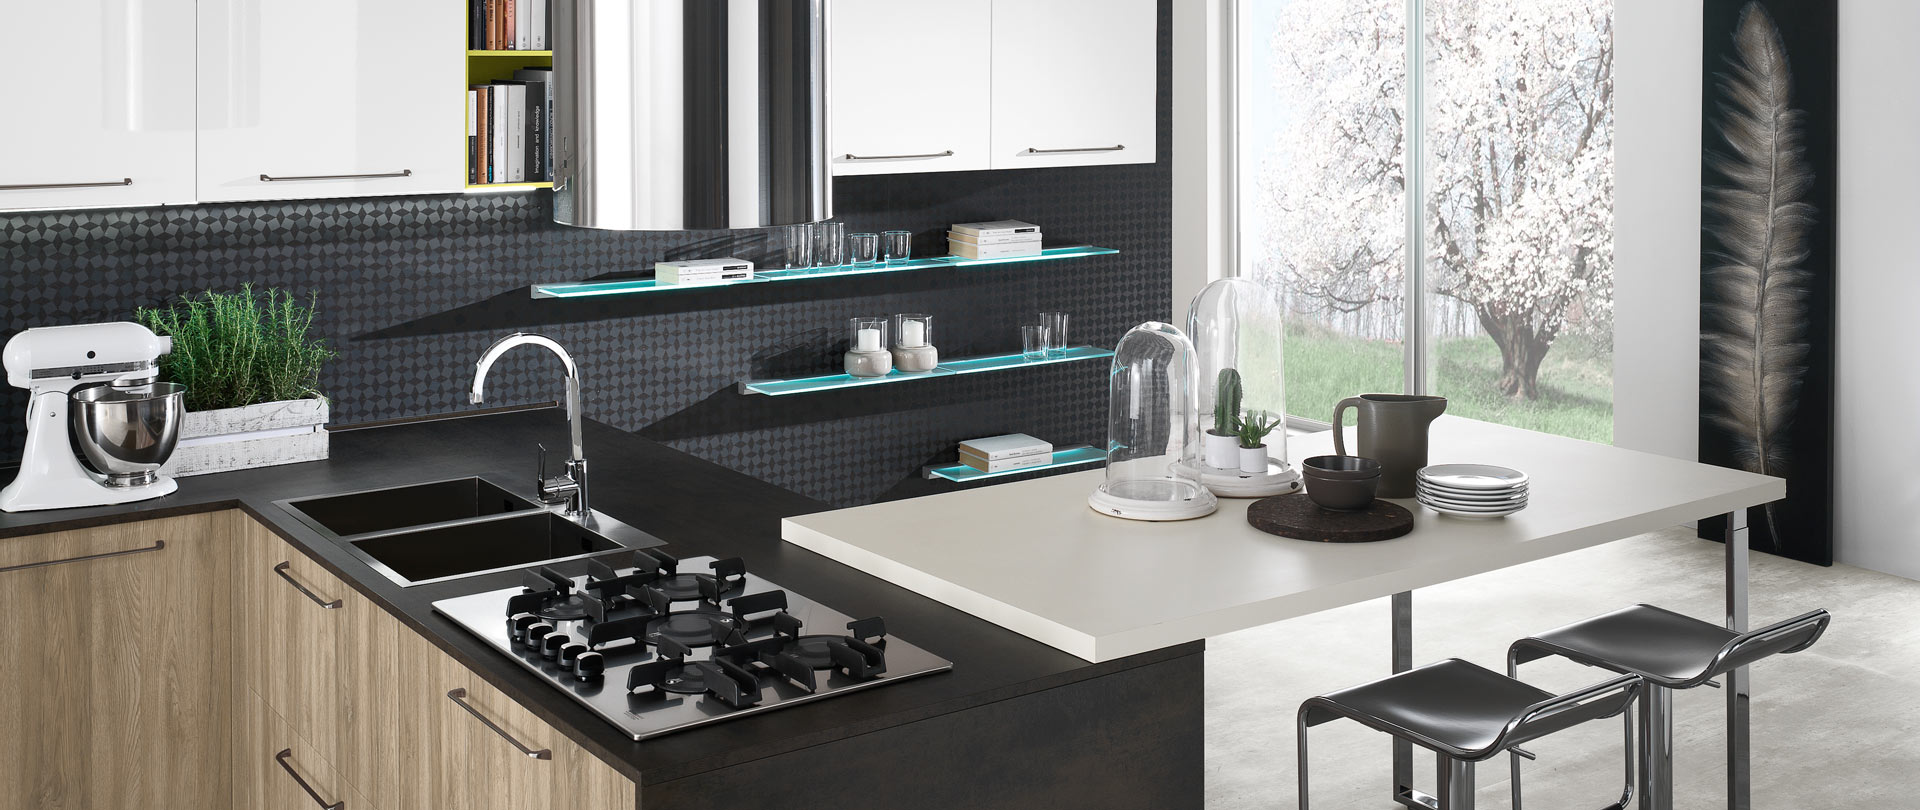 05-evo-cucina-aurora_rovere-moka